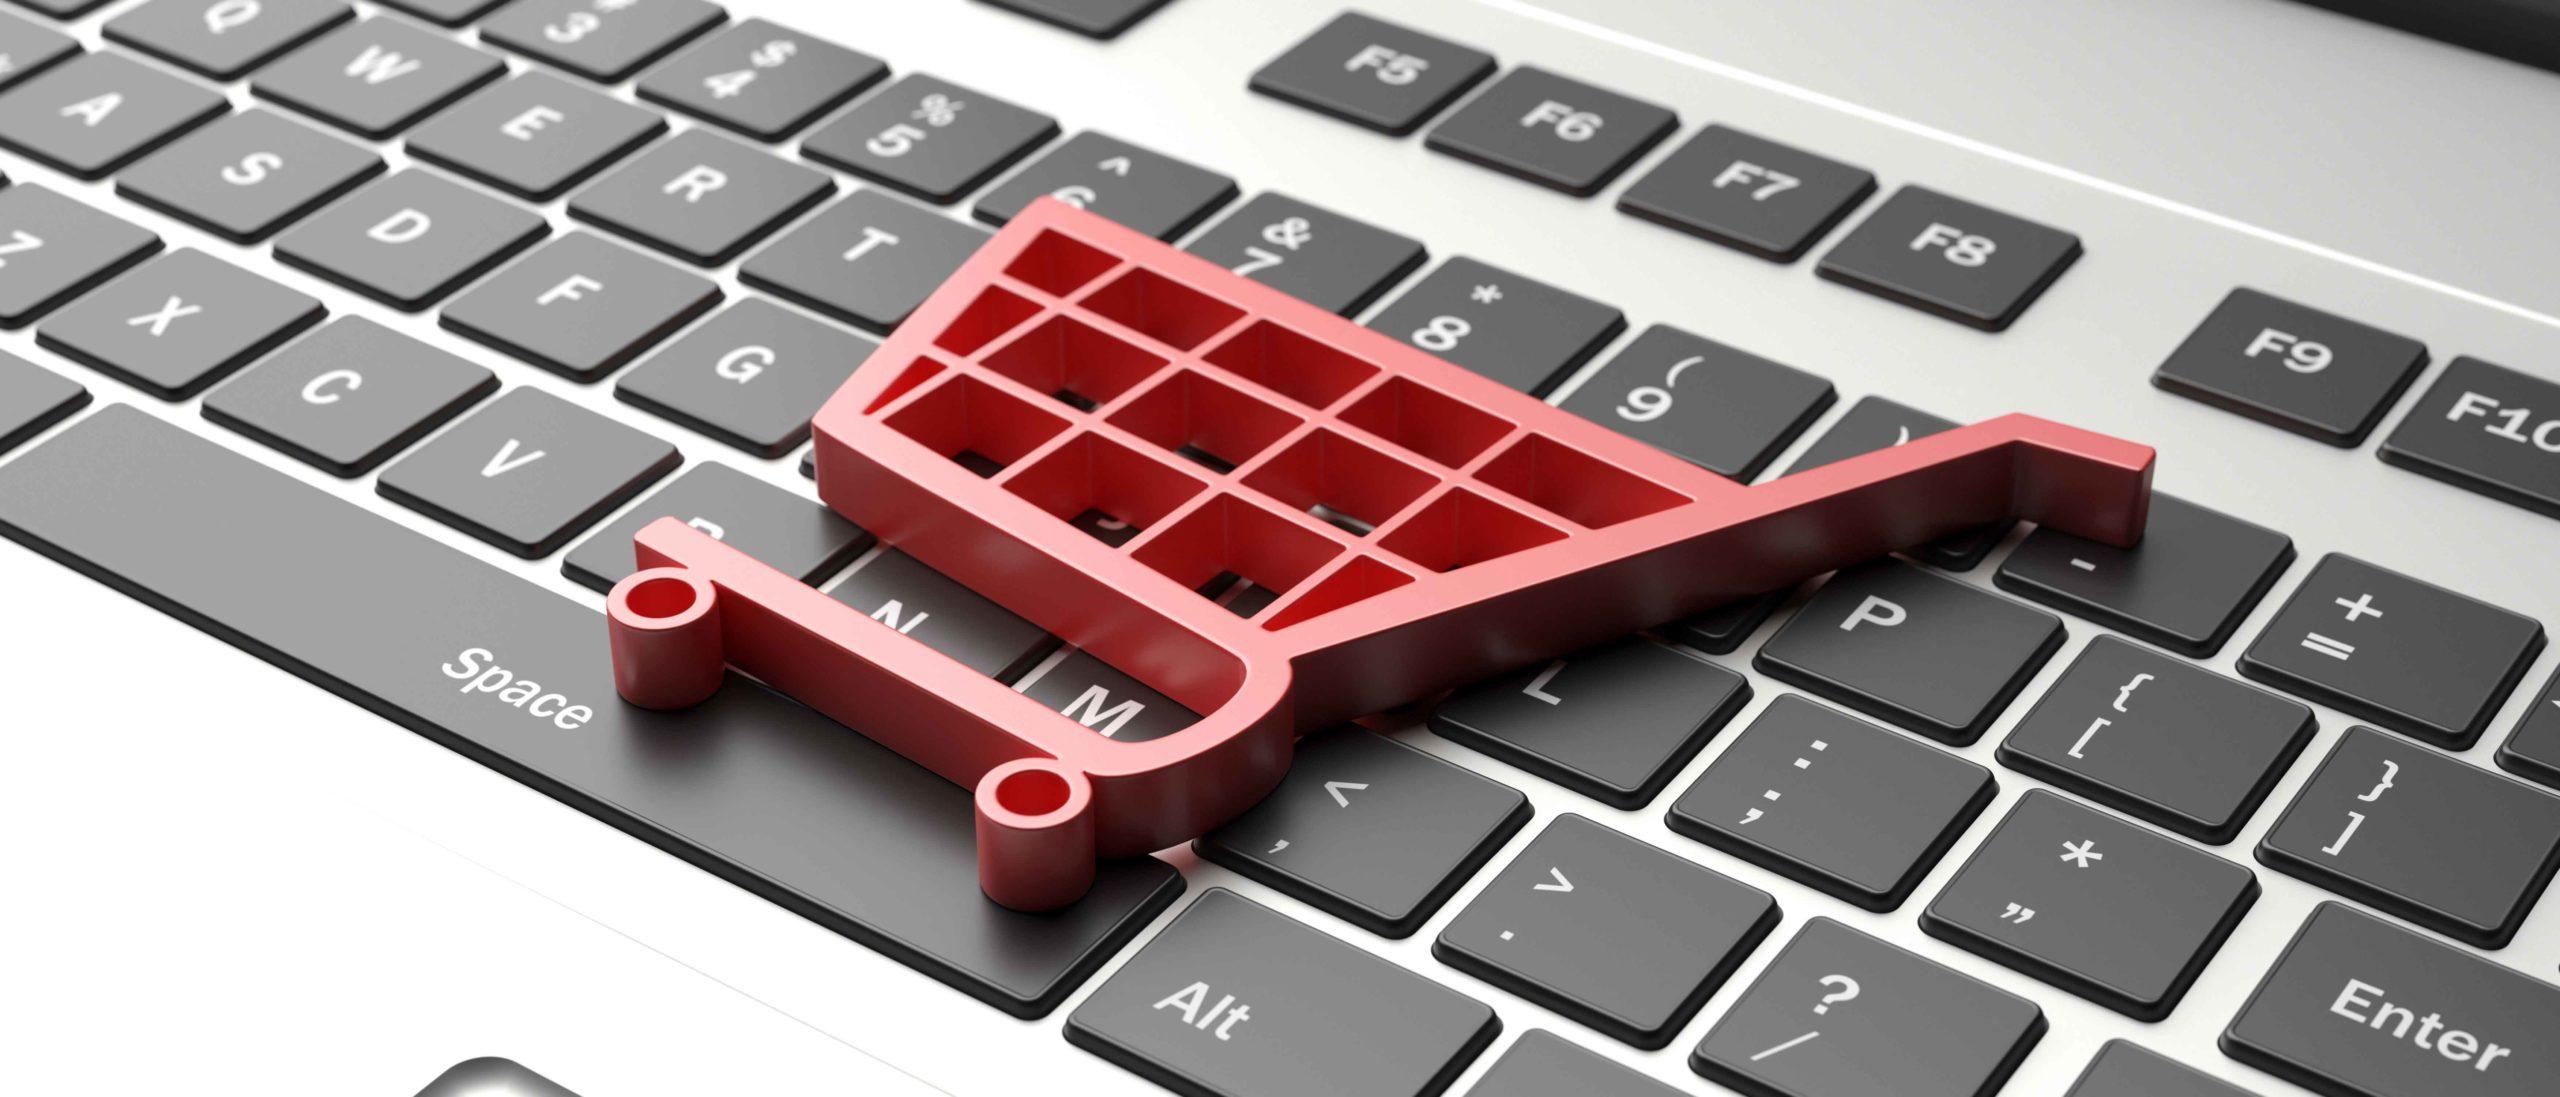 e-commerce-symbol-on-a-computer-keyboard-black-fri-PV7TGNB